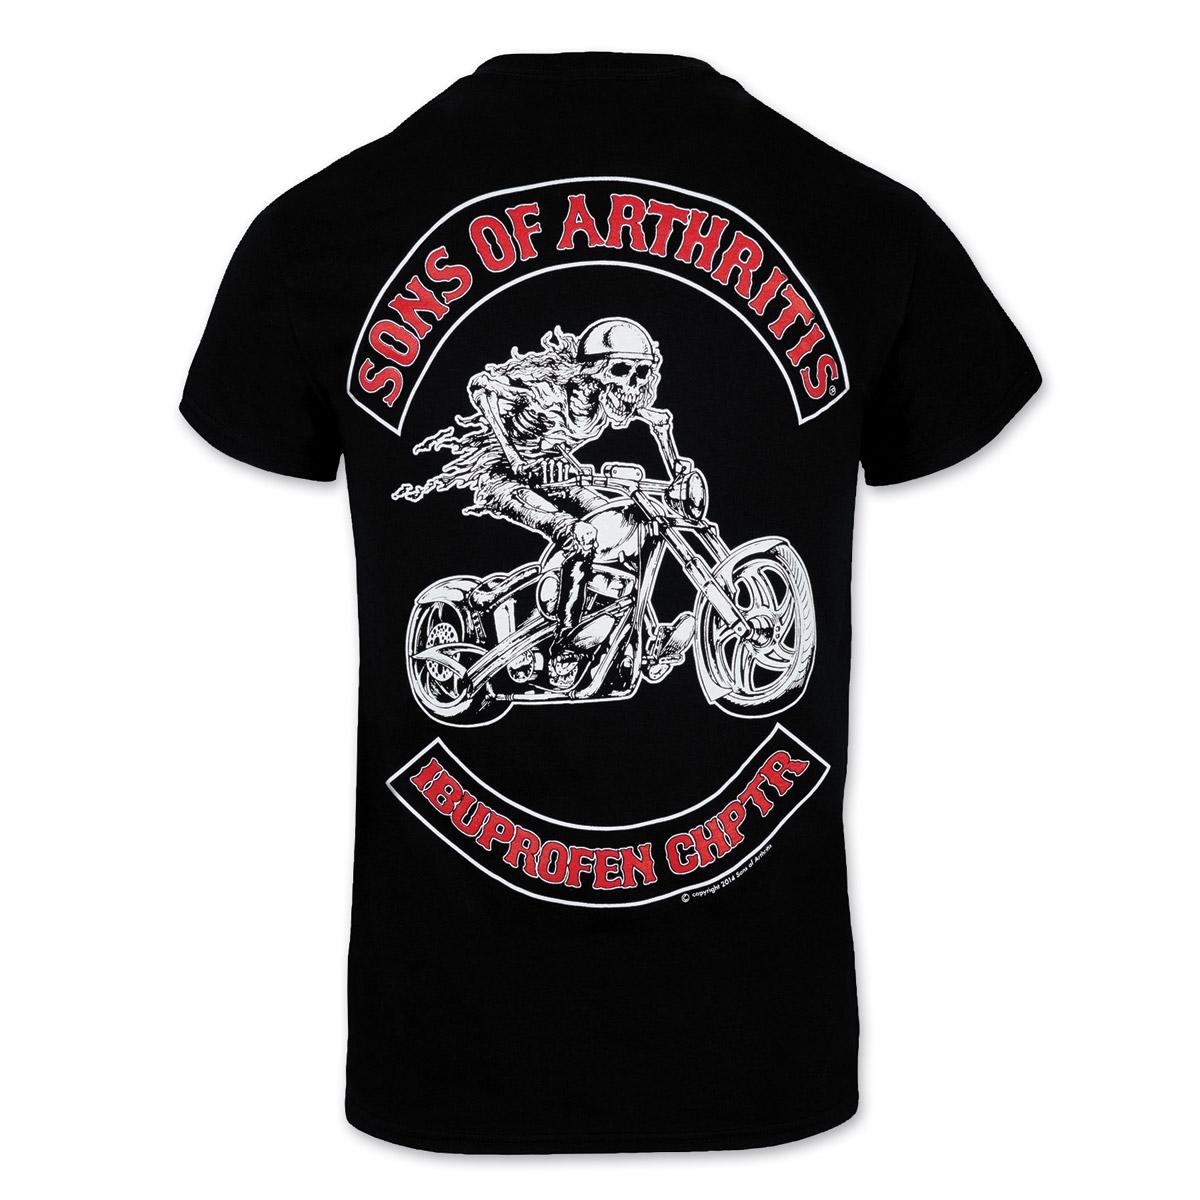 Sons of Arthritis Men's Ibuprofen Chapter Black T-Shirt